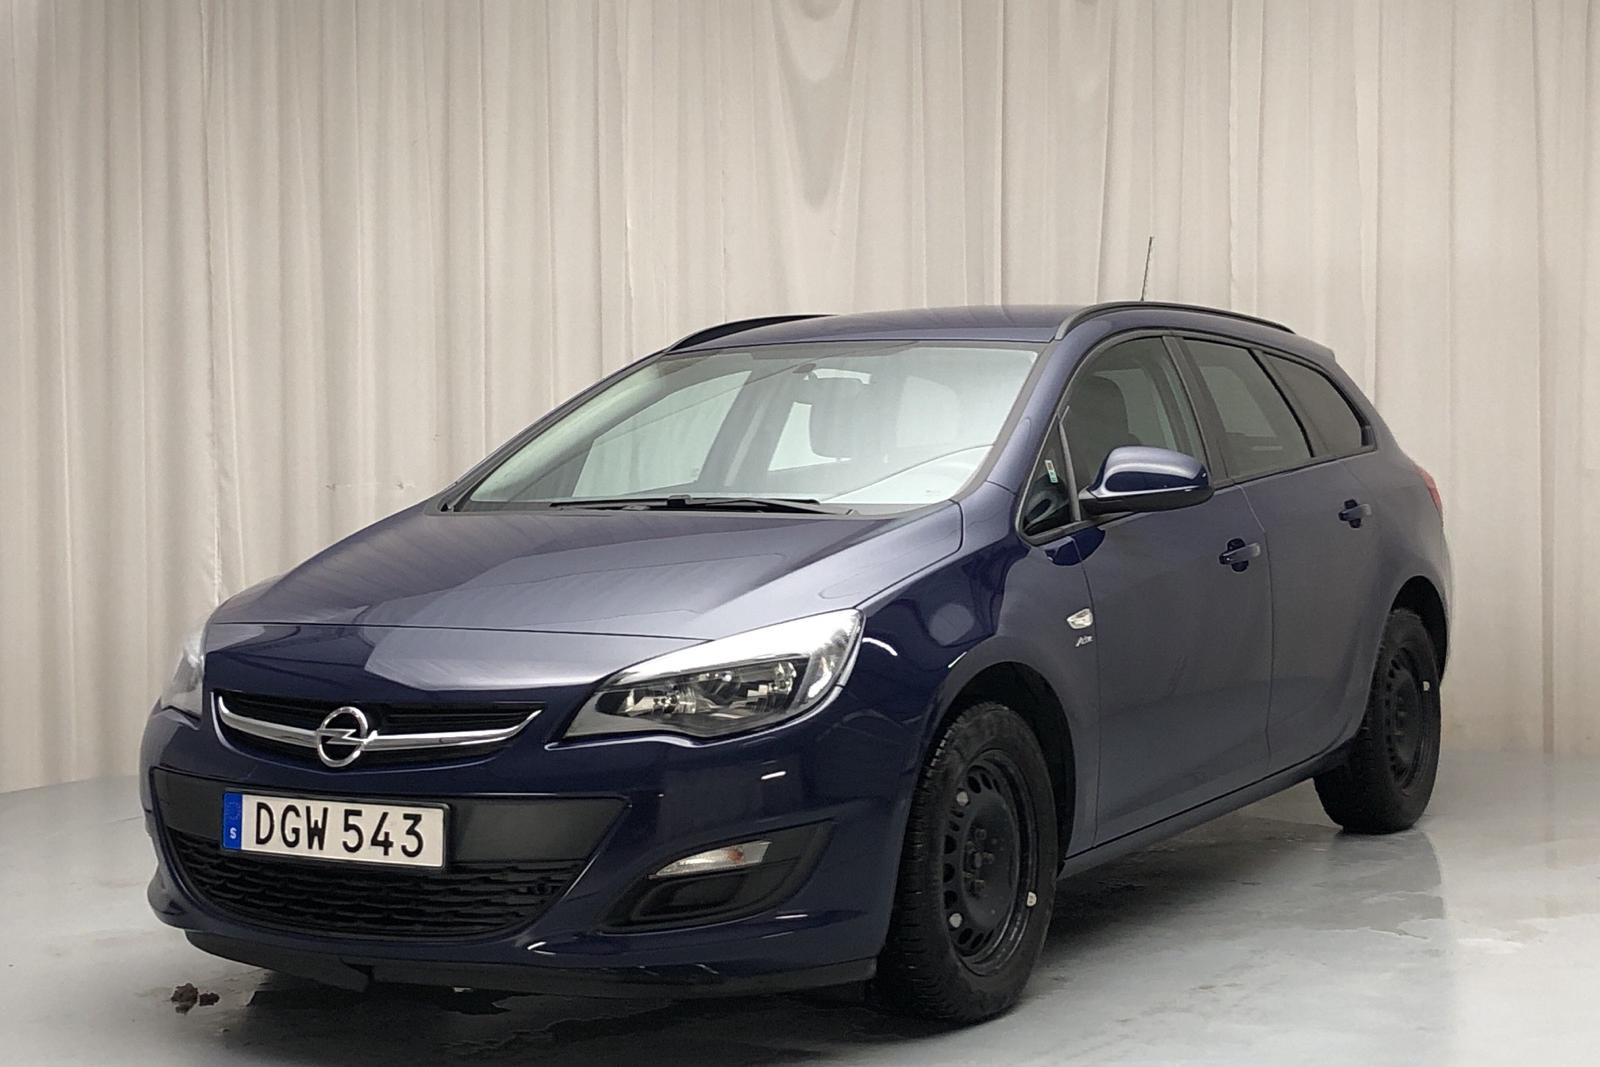 Opel Astra 1.6 ECOTEC Sports Tourer (115hk) - 3 148 mil - Manuell - blå - 2014